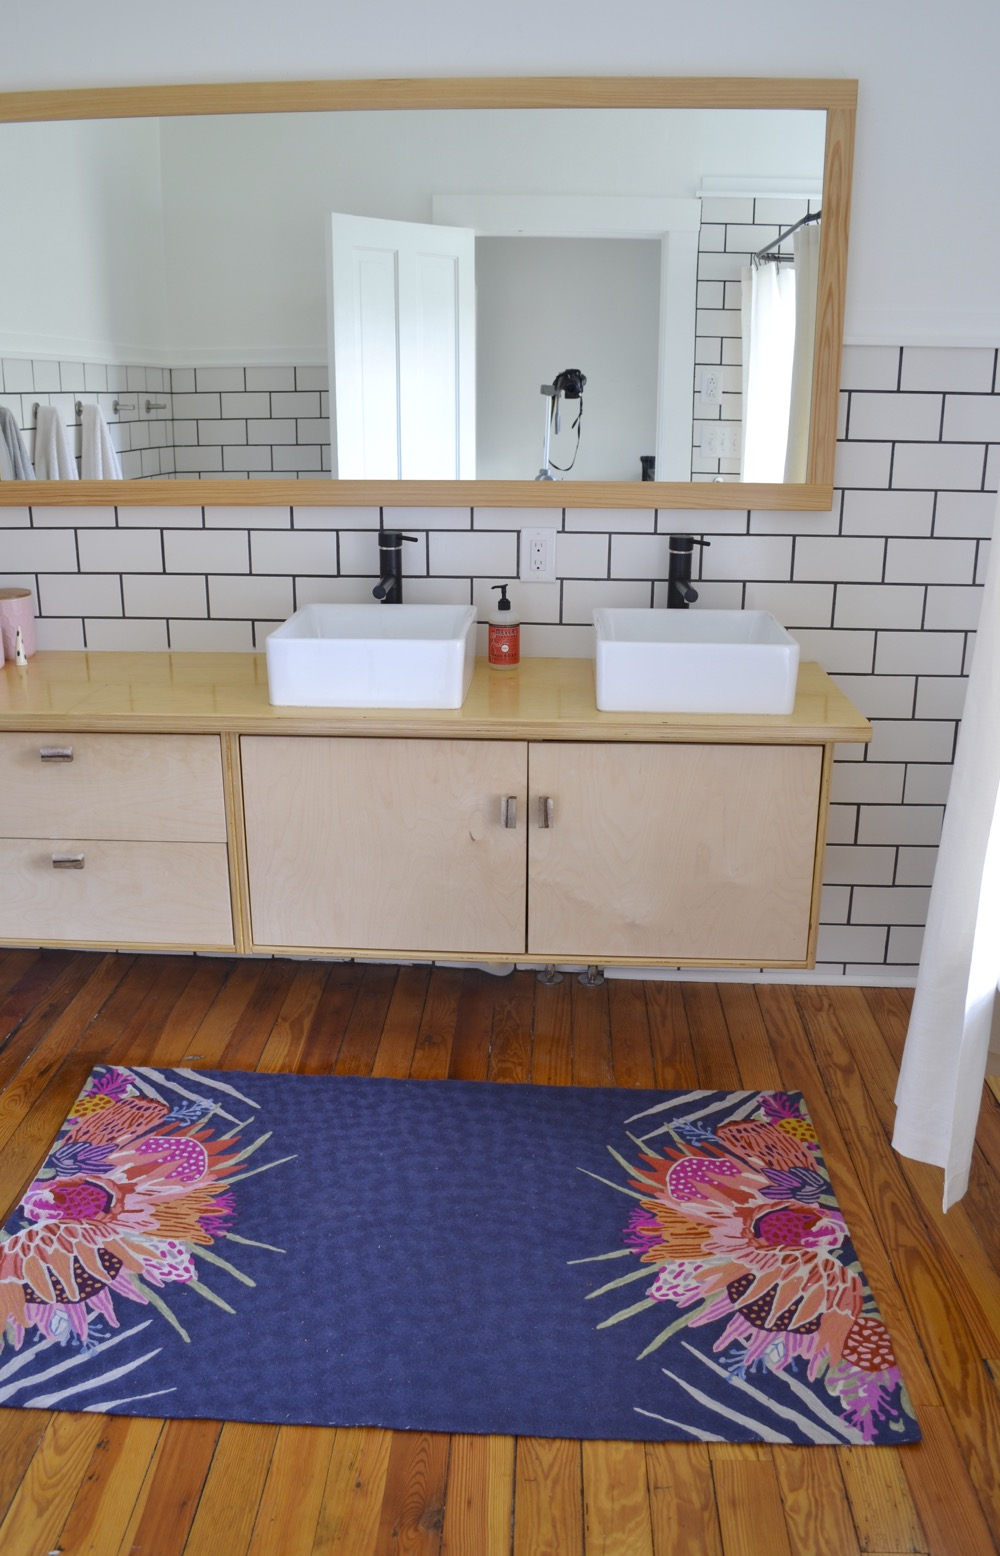 Bathroom-decor-ideas-budget-diy09.jpg